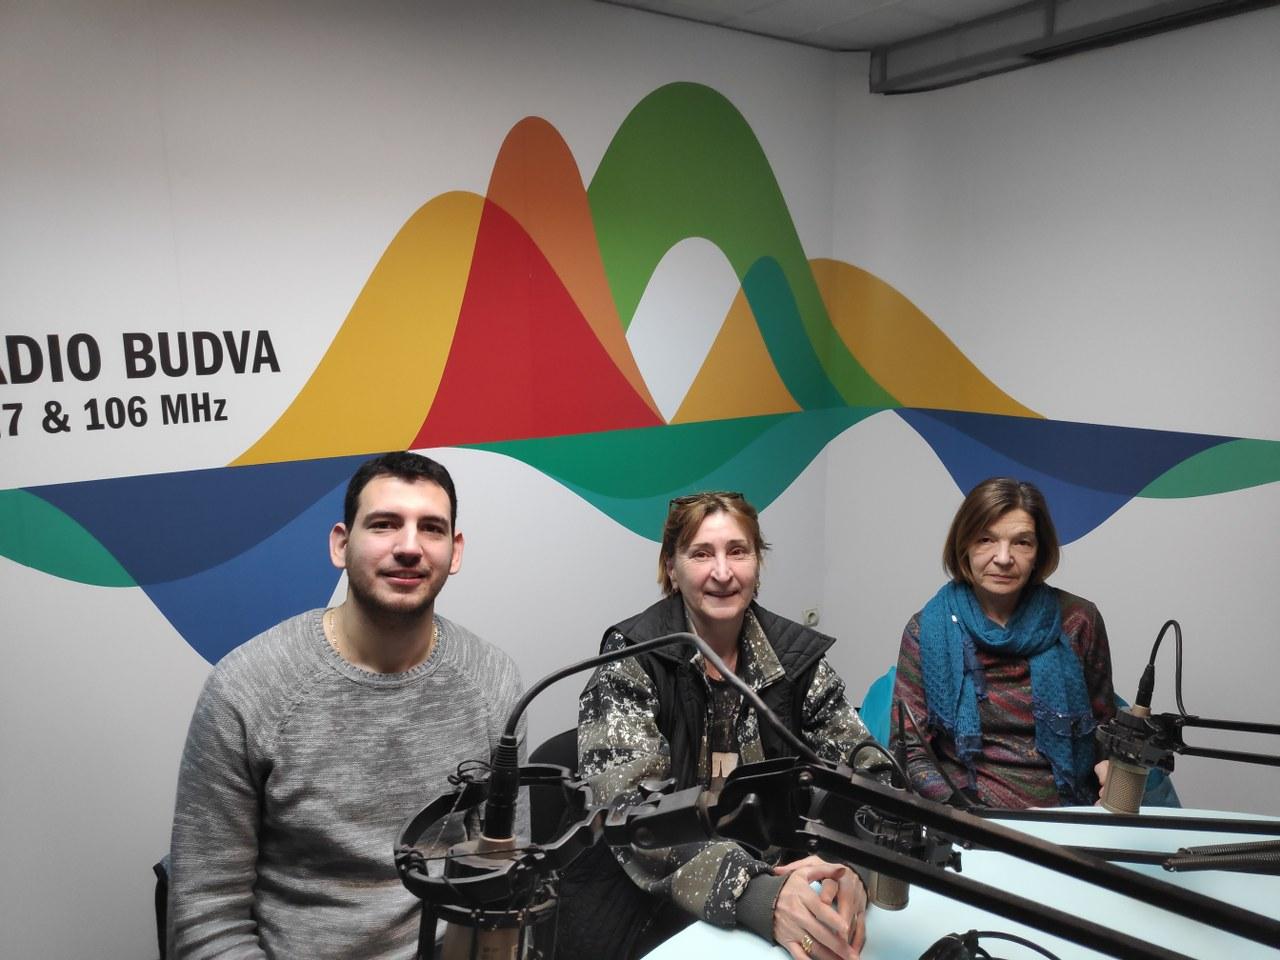 "Dušan Medin i Dragana Lalošević predstavili OJU ""Muzeji"" Kotor na Radiju Budva"